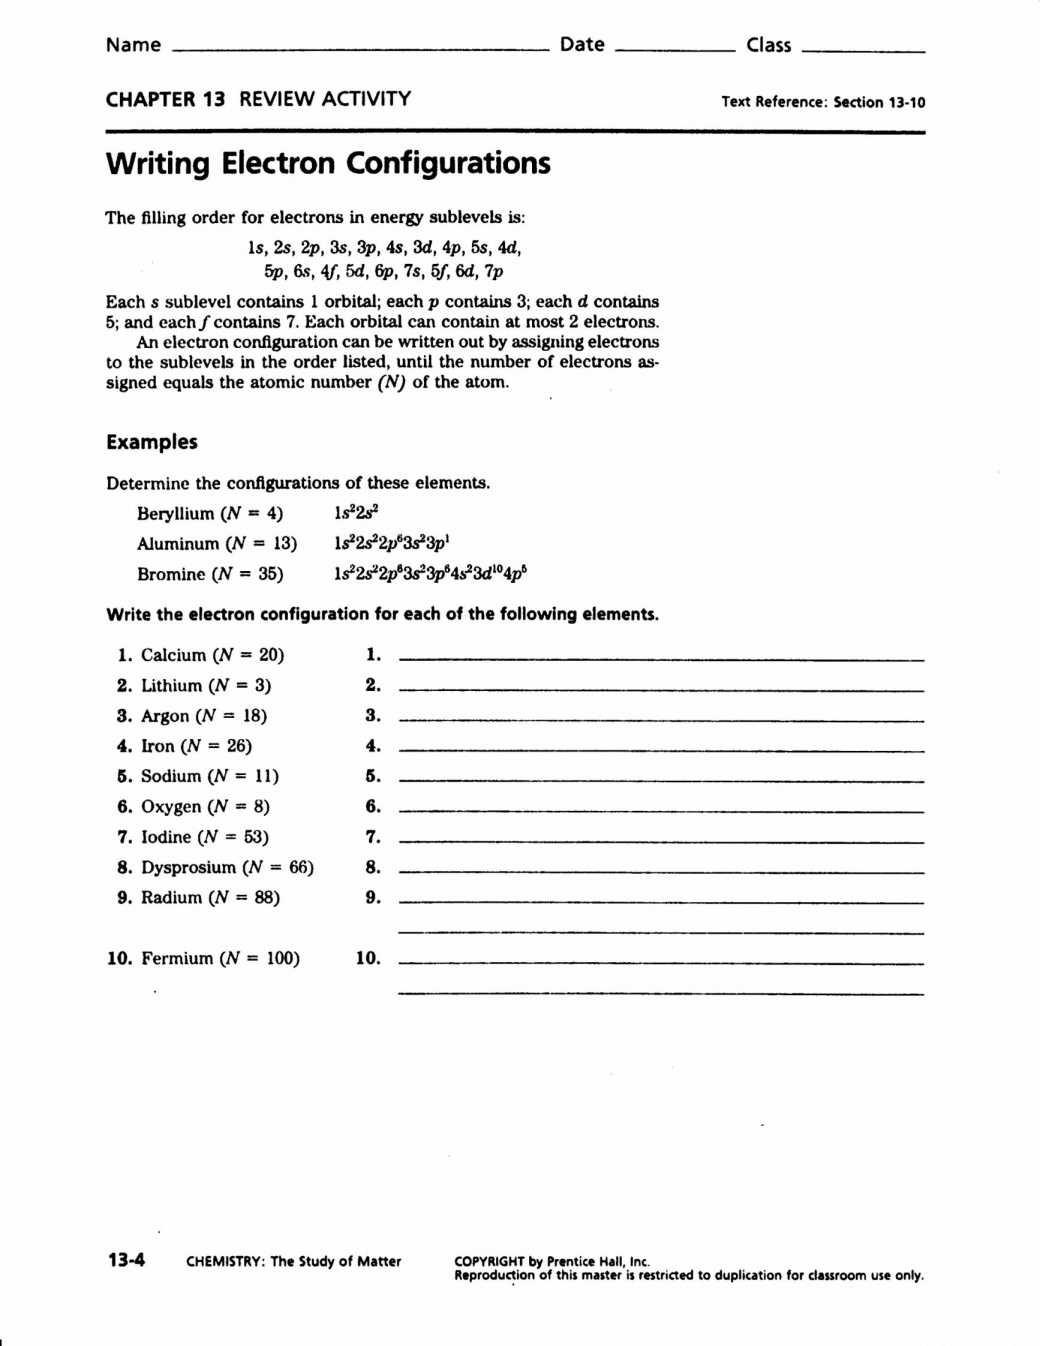 Physical Vs Chemical Properties Worksheet Lovely Worksheet 2 Physical Chemical Properties Changes